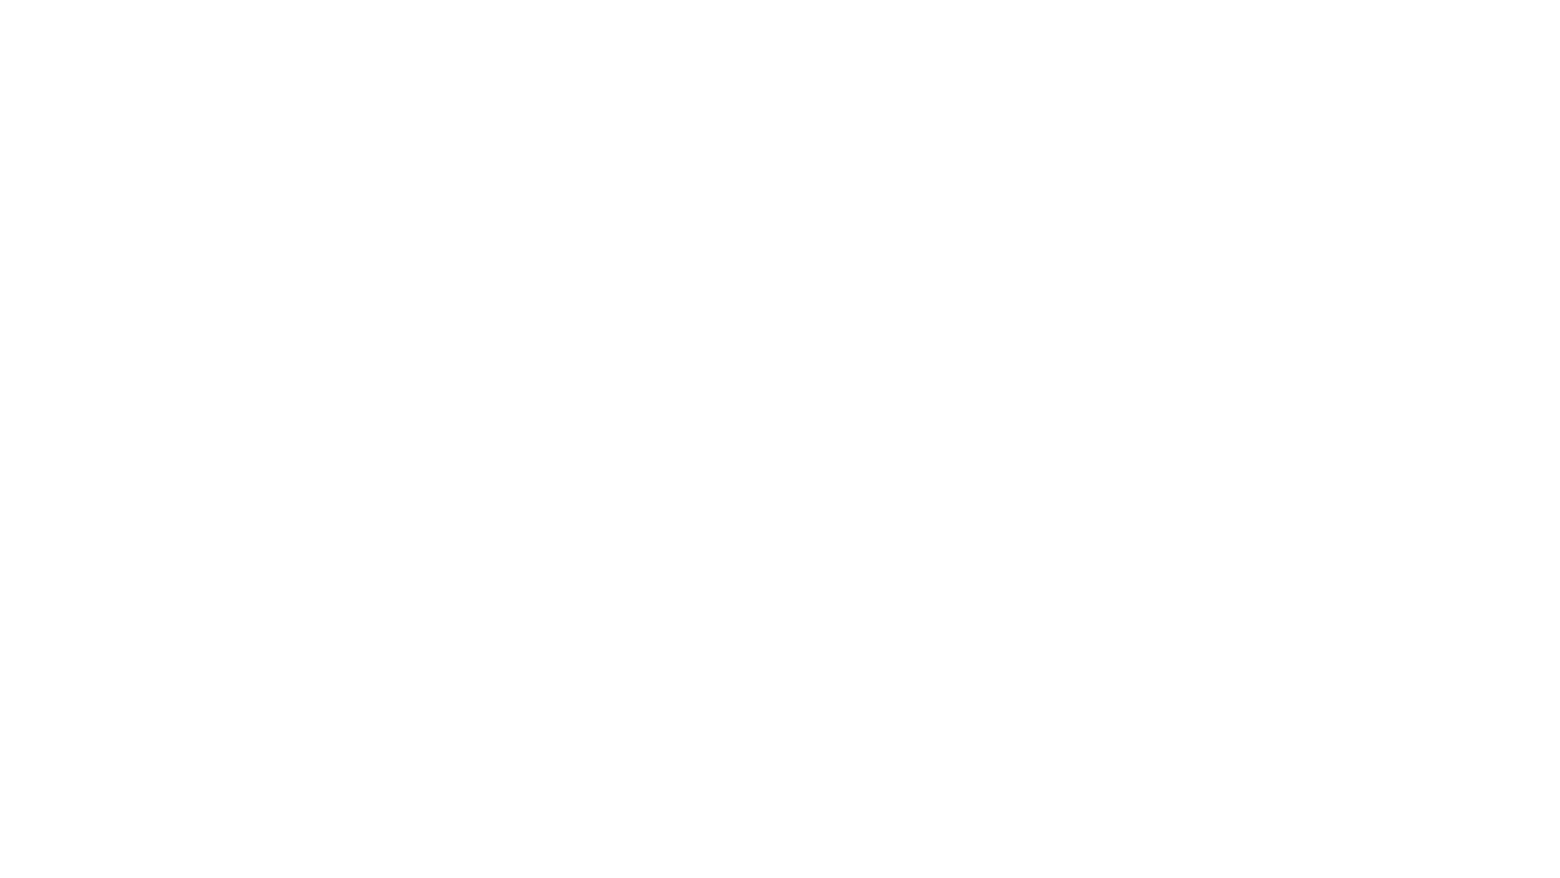 Paul Klee, Sammlung Rosengart Luzern